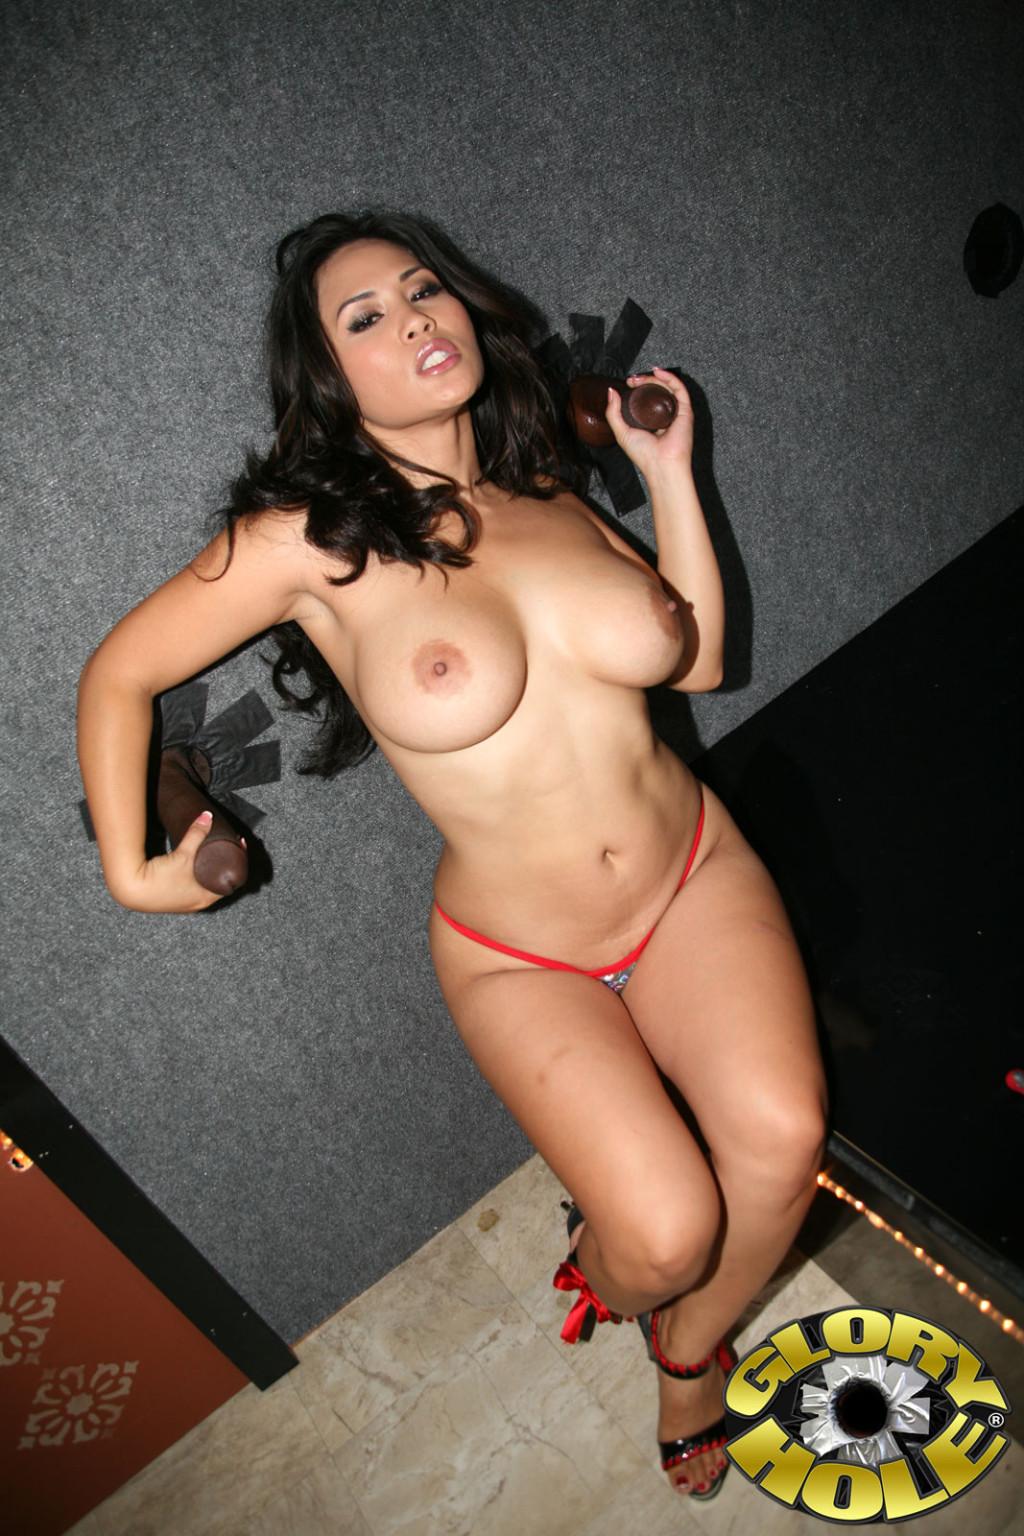 Jessica bangkok порно в hd качестве